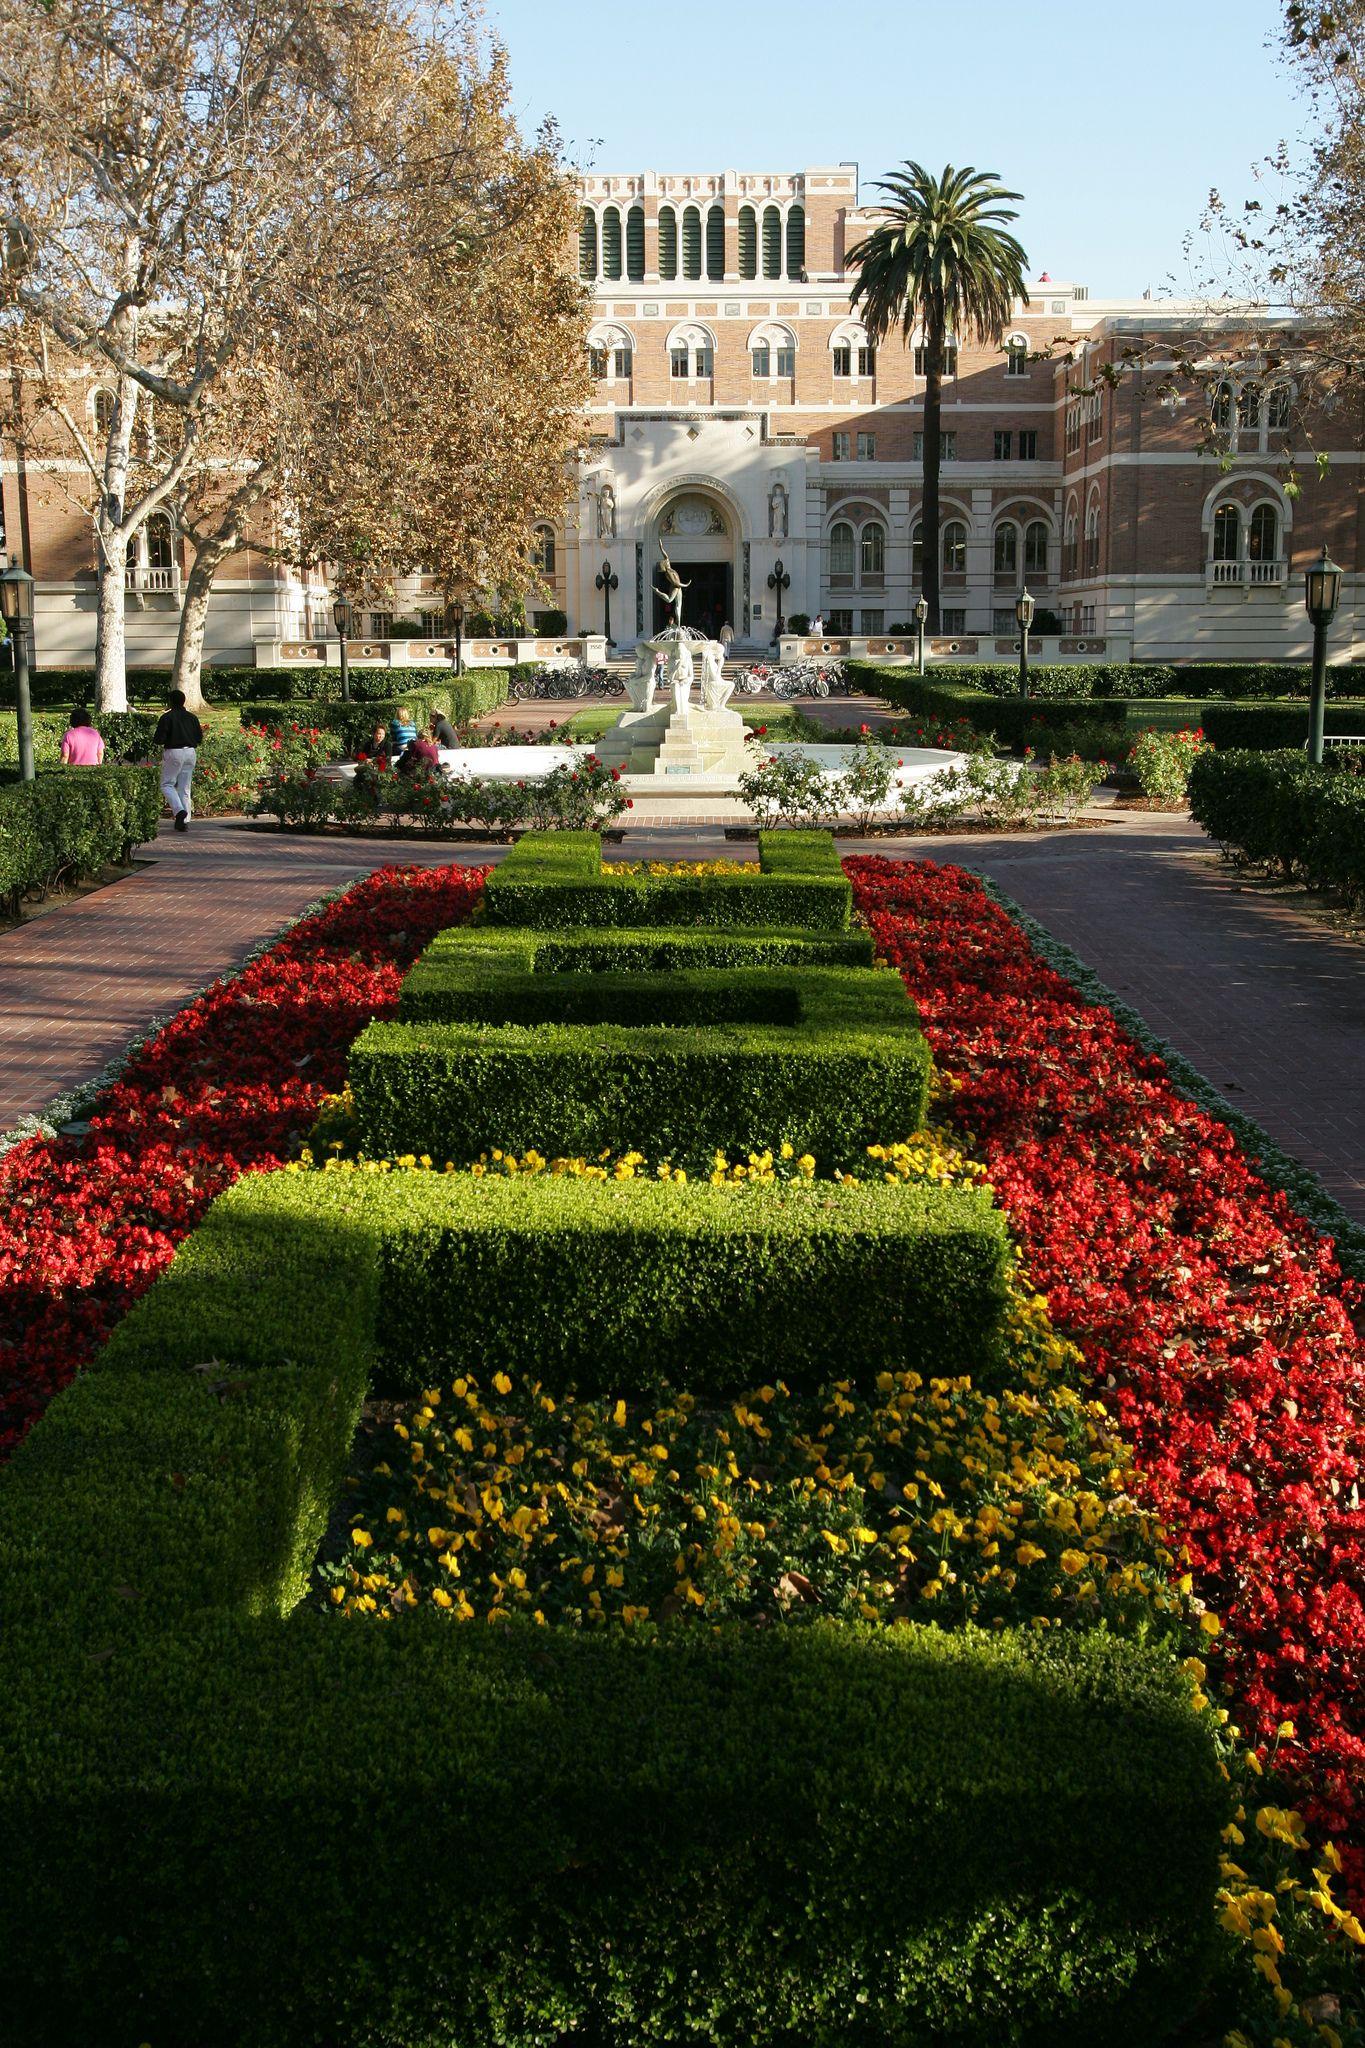 Alumni Park University of southern california, Social